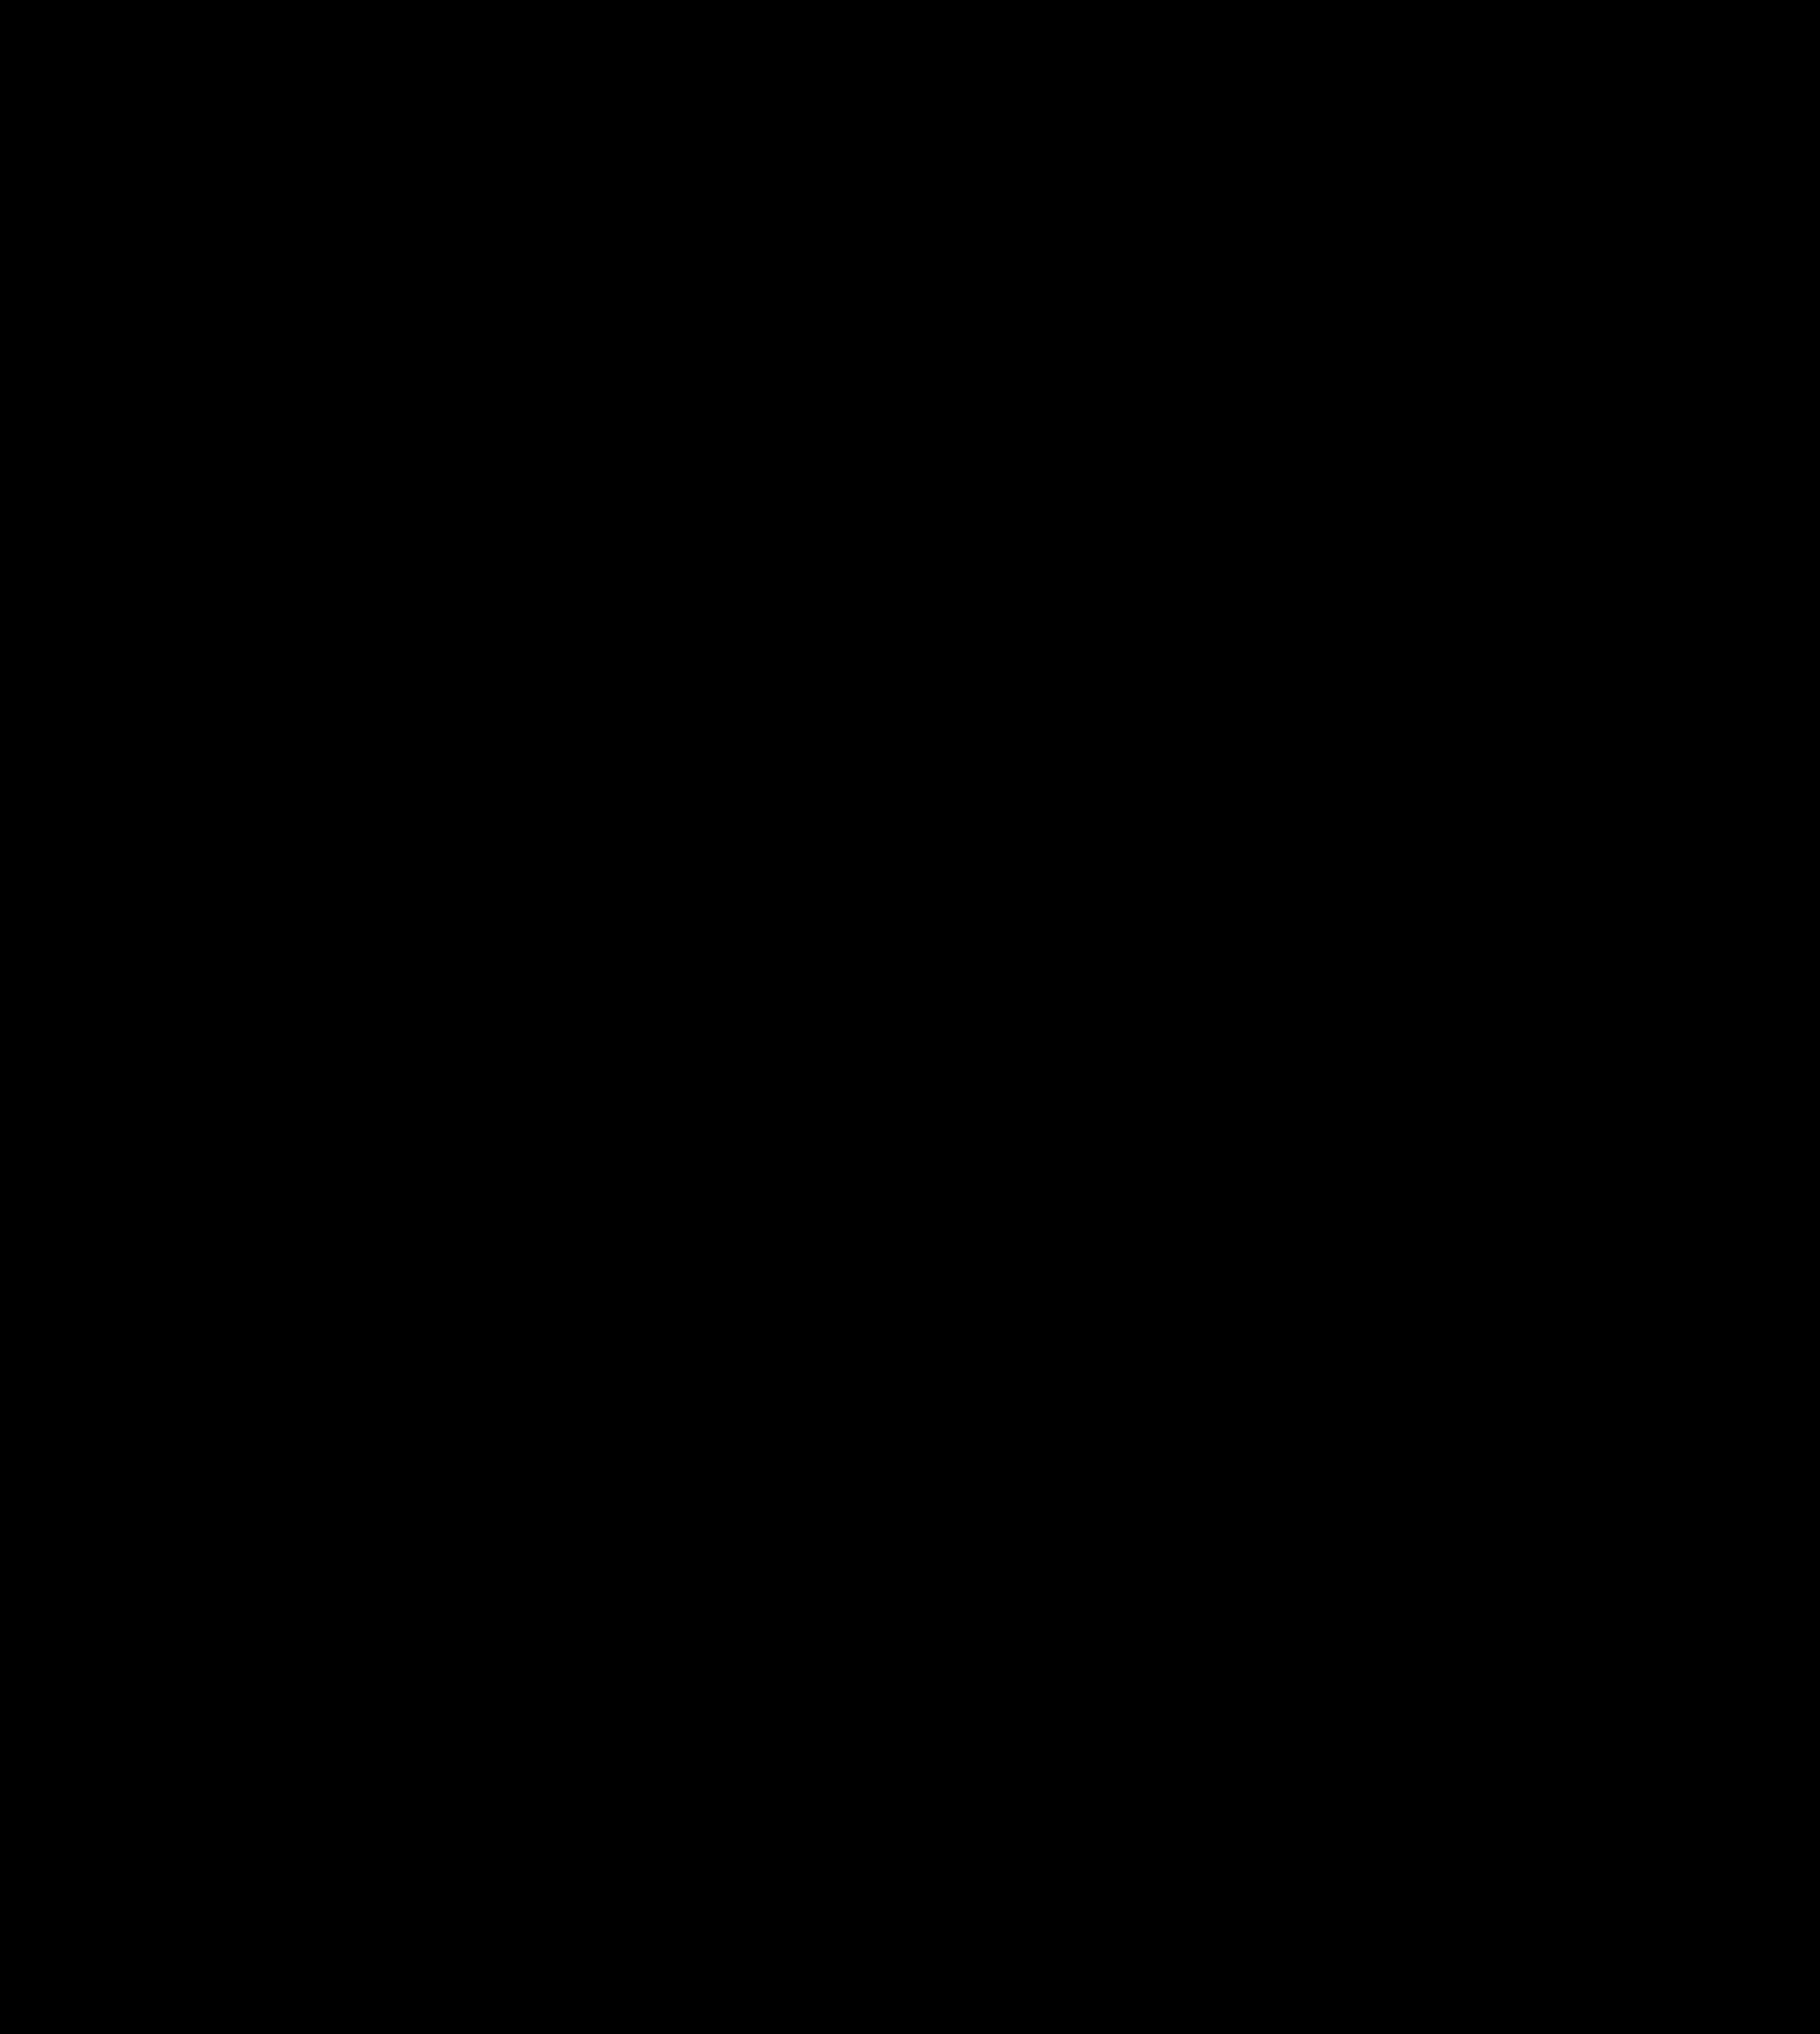 Amer Greeting Cards Logo Png Transparent Svg Vector Freebie Supply